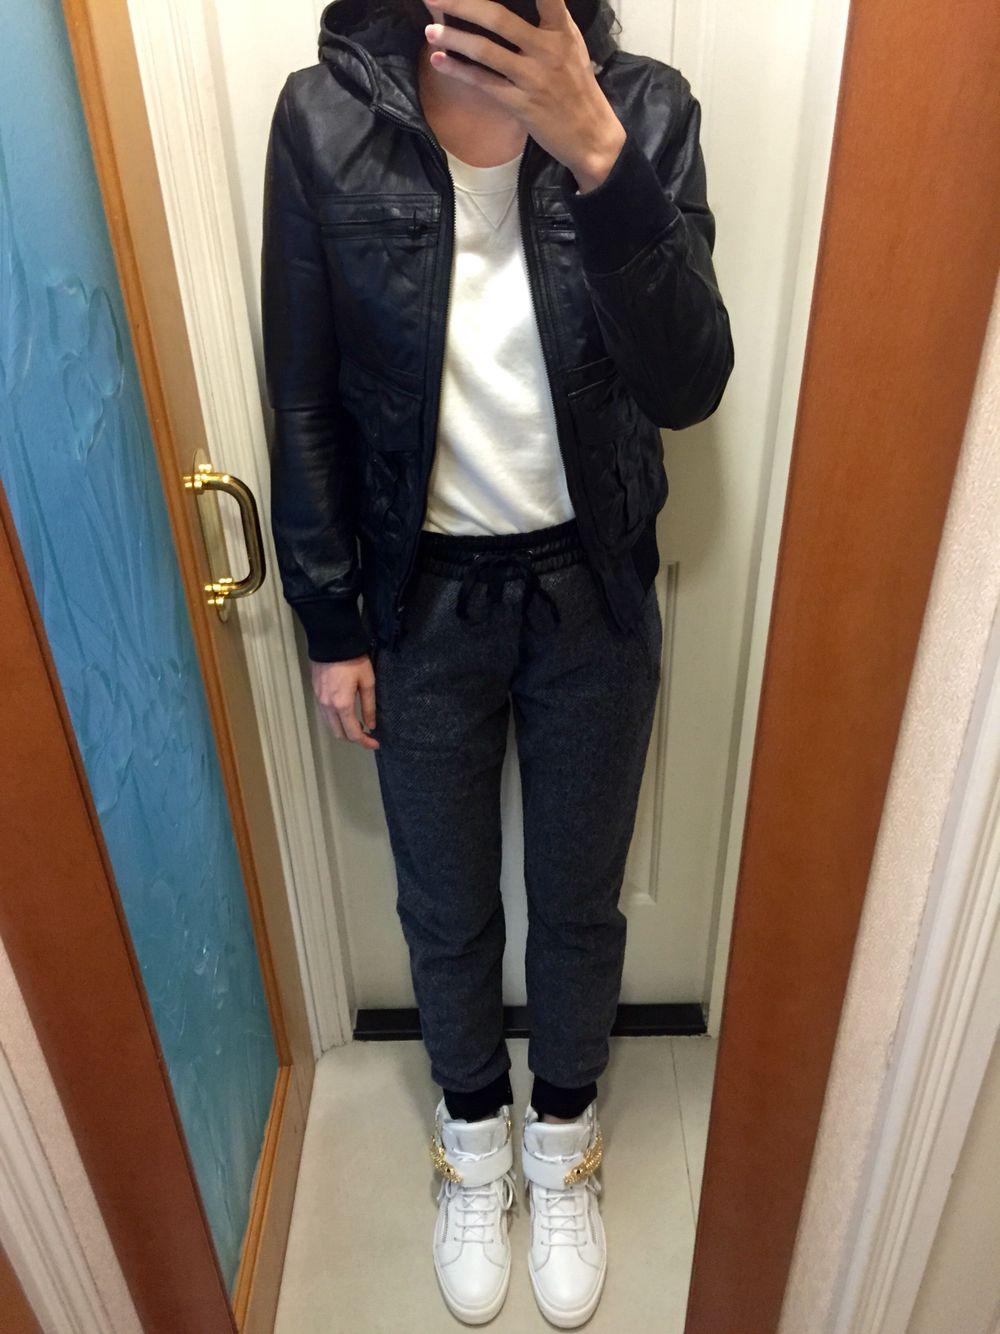 Leather jacket uniqlo - Hysteric Glamour Leather Jacket Uniqlo Sweatshirt Zara Tweed Sweatpants Giuseppe Zanotti White High